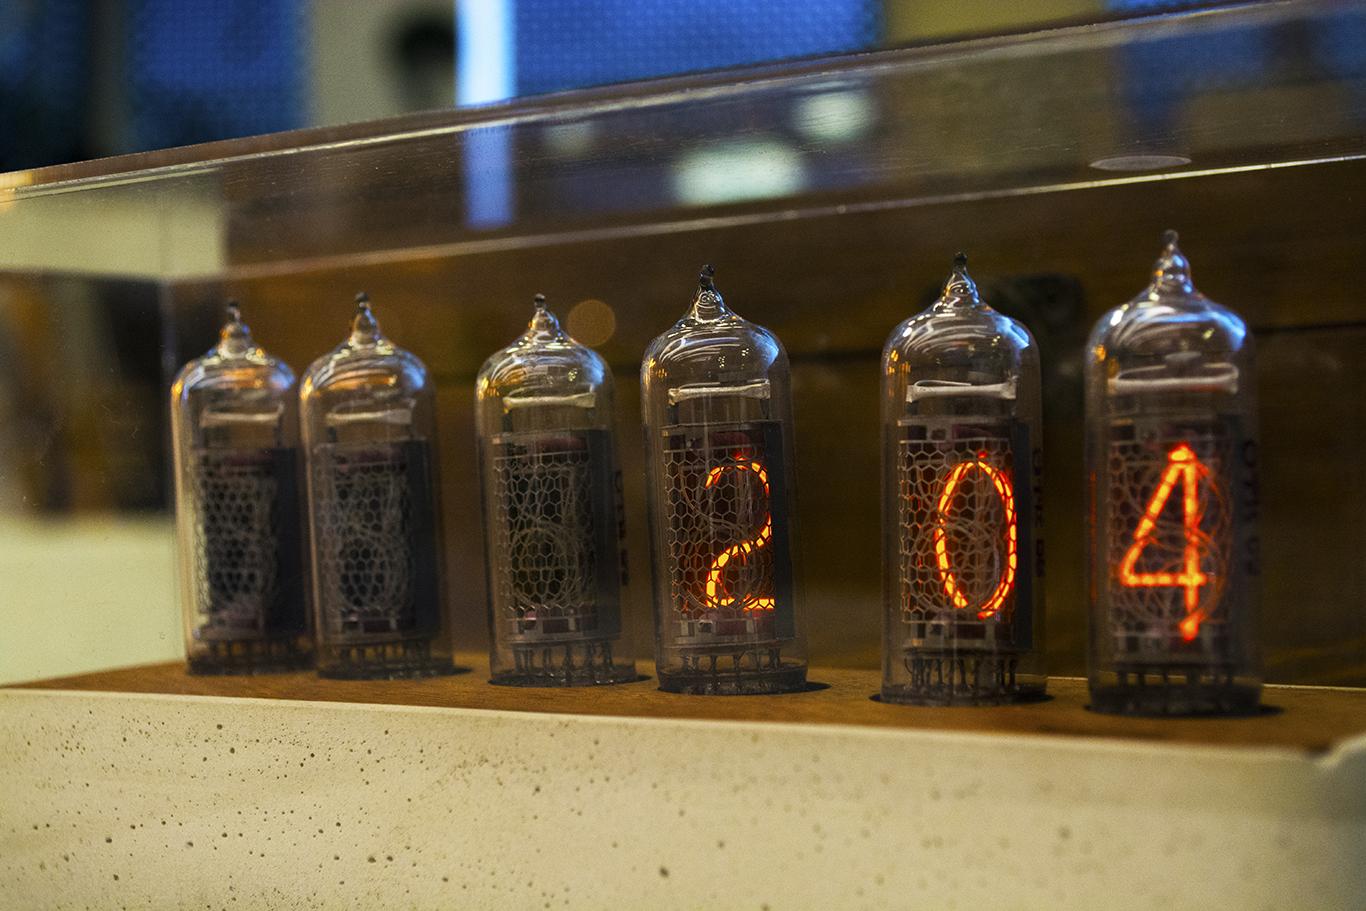 A Nixie tube clock on display at the Dongdaemun Design Plaza in Seoul, South Korea.  (CHRISTOPHER CAMERON/THE STATESMAN)